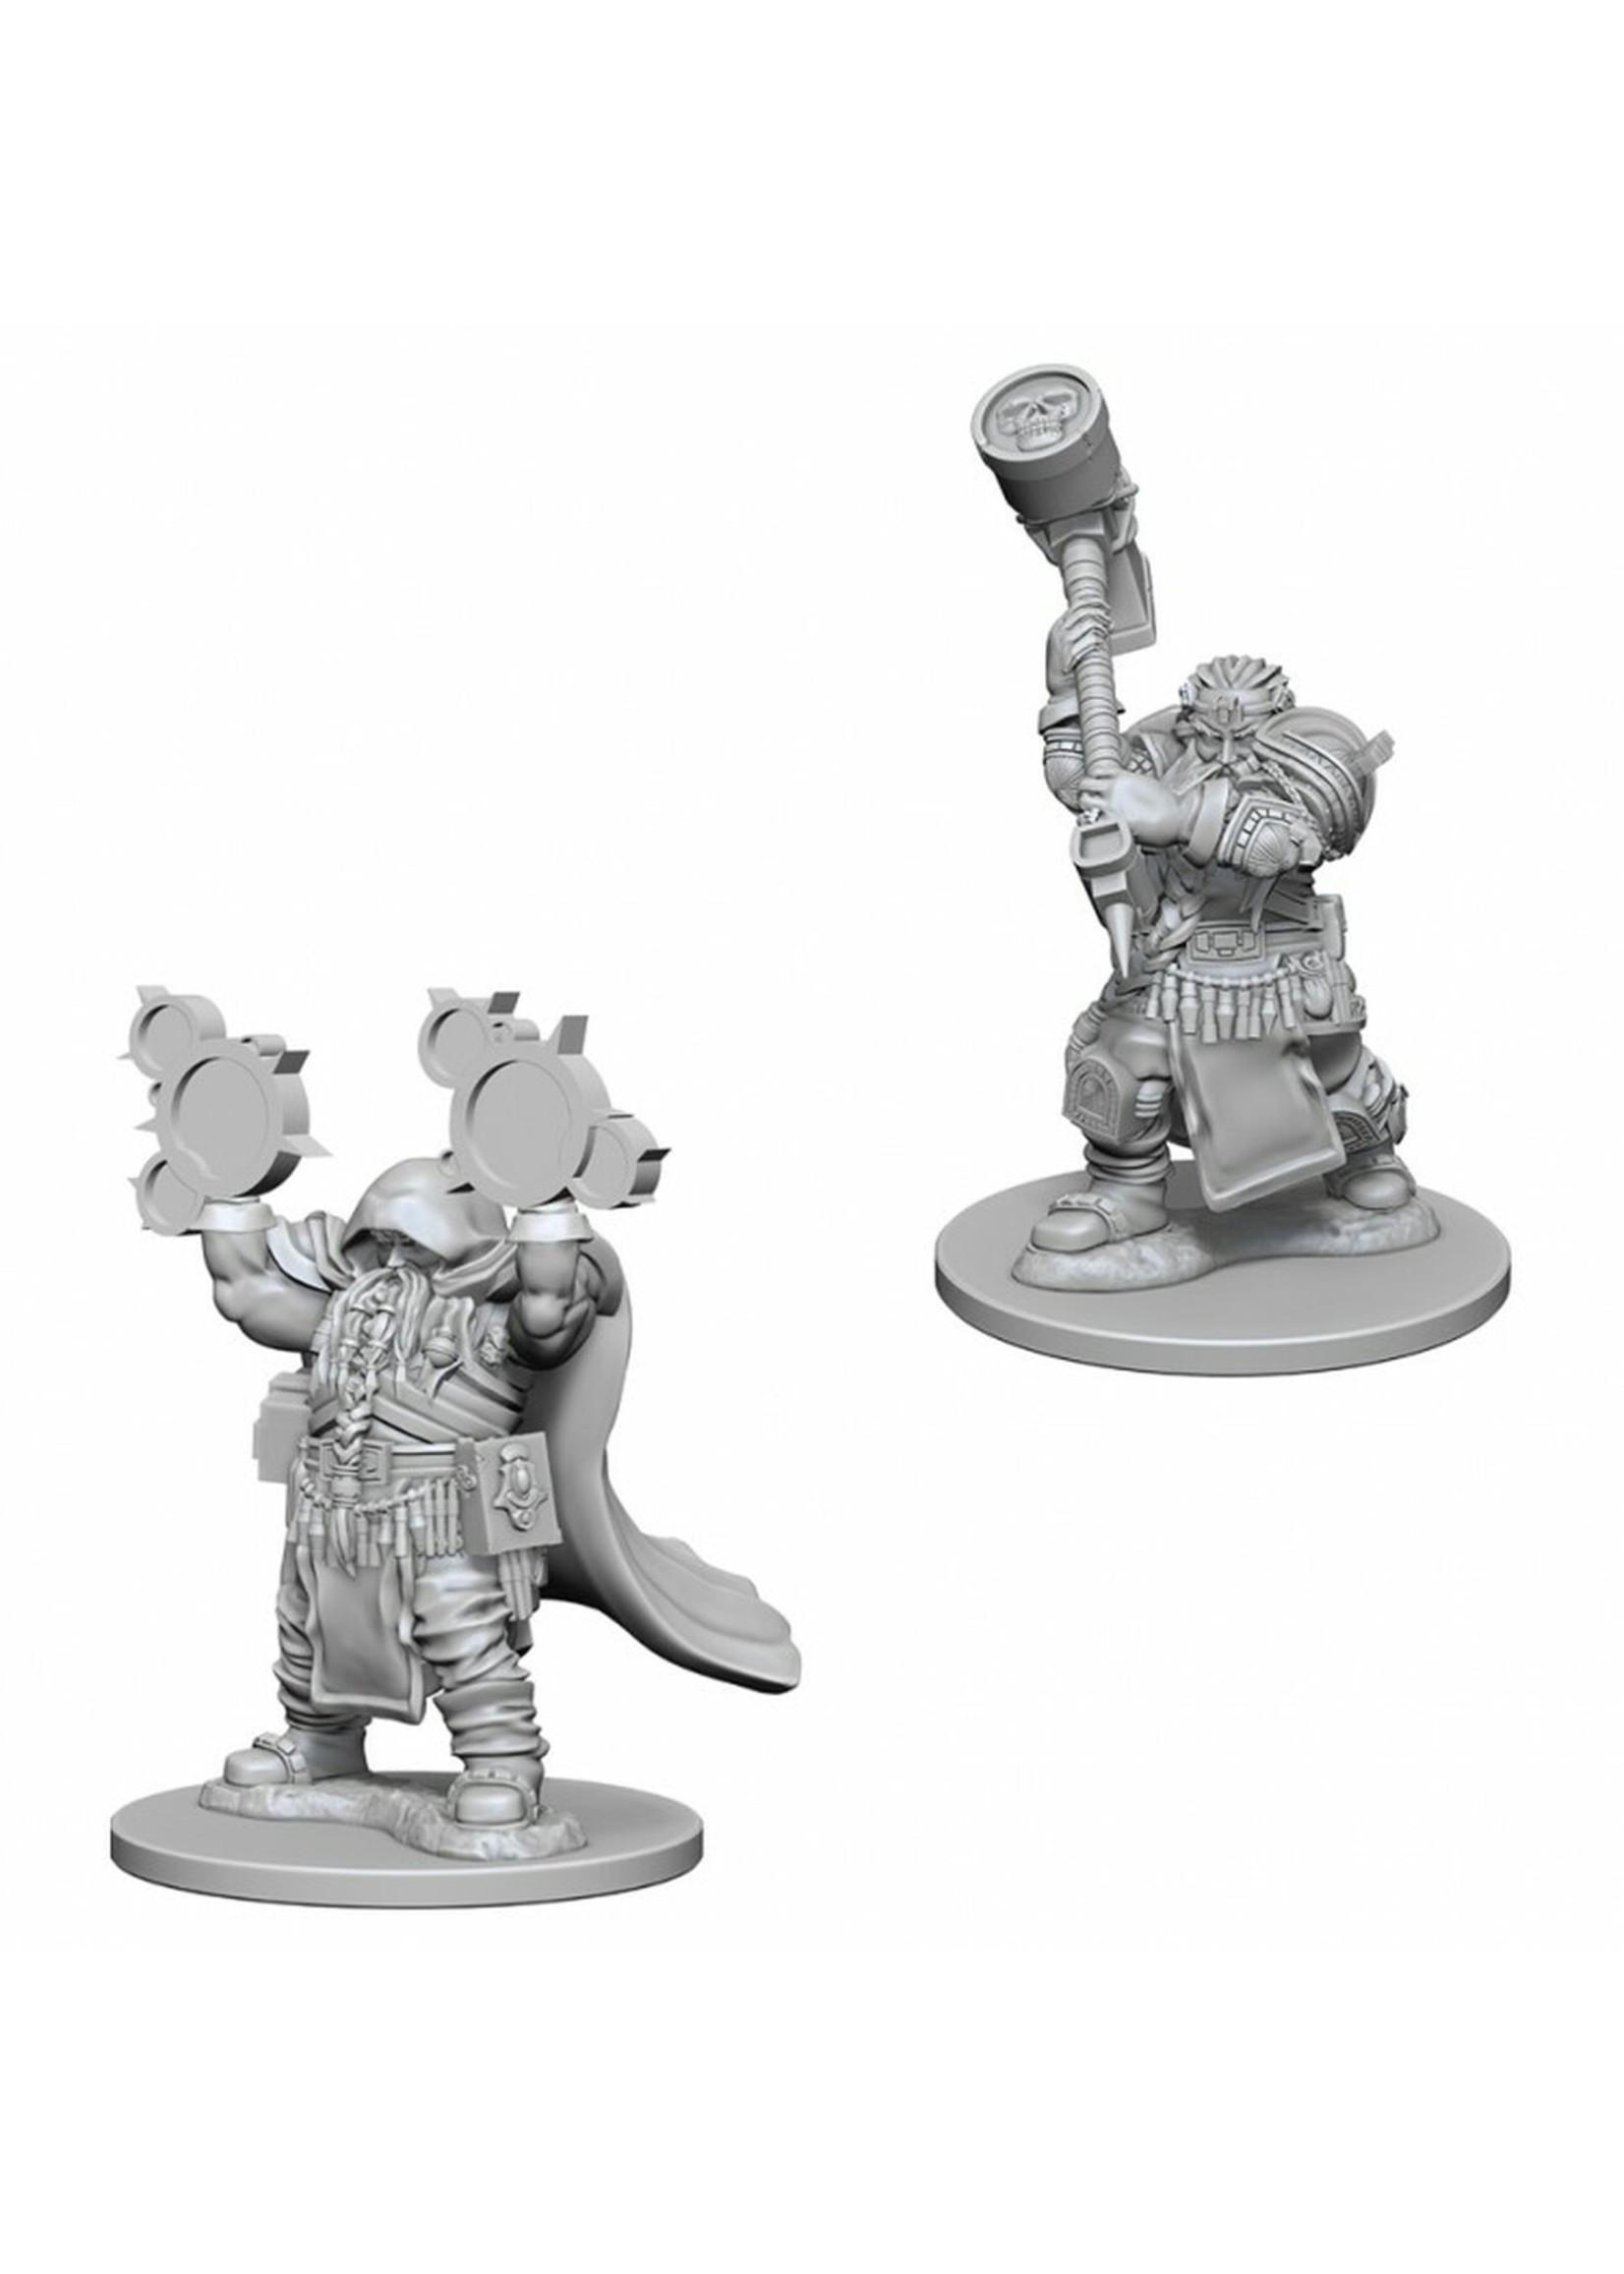 Dungeons & Dragons Nolzur`s Marvelous Unpainted Miniatures: W2 Dwarf Male Cleric